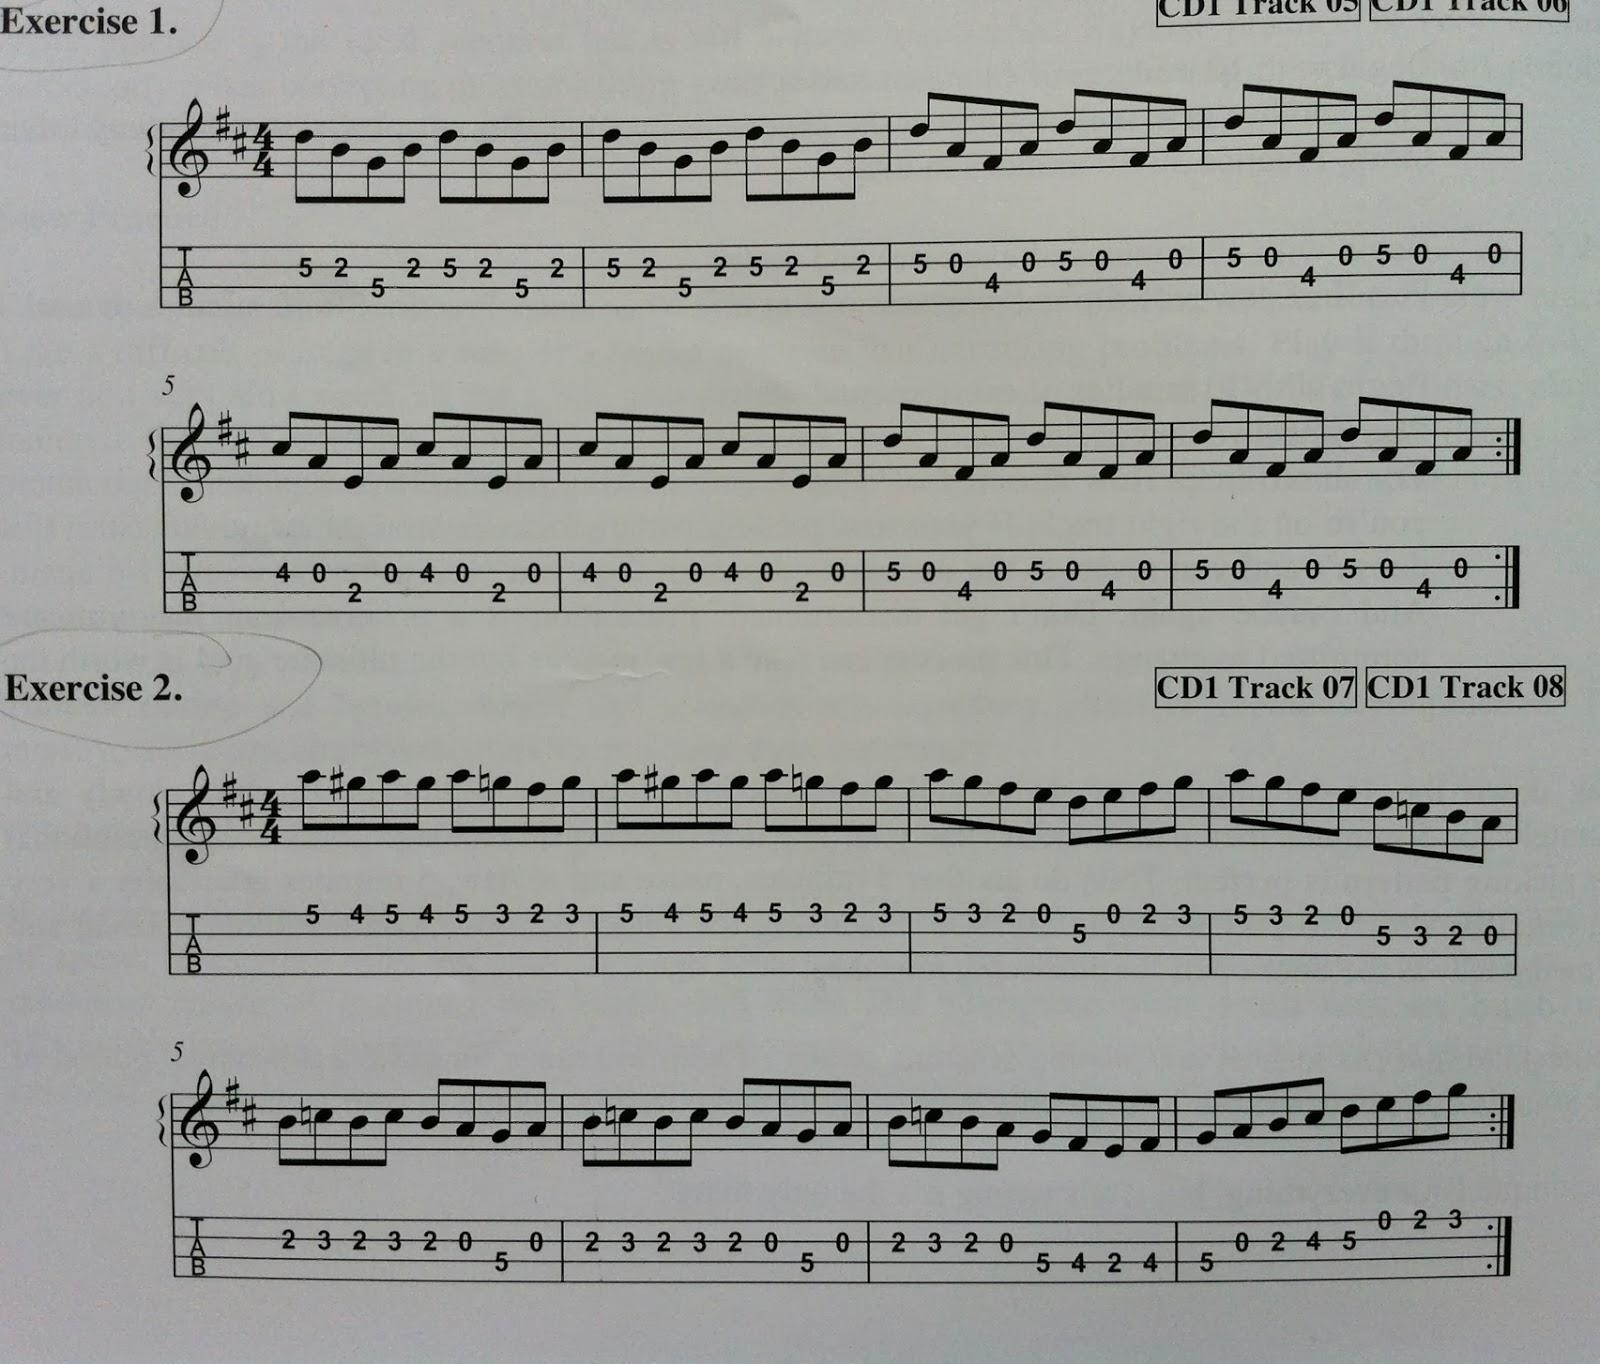 Six Water Grog: Plucking/Picking Exercises for Tenor Banjo/Mandolin